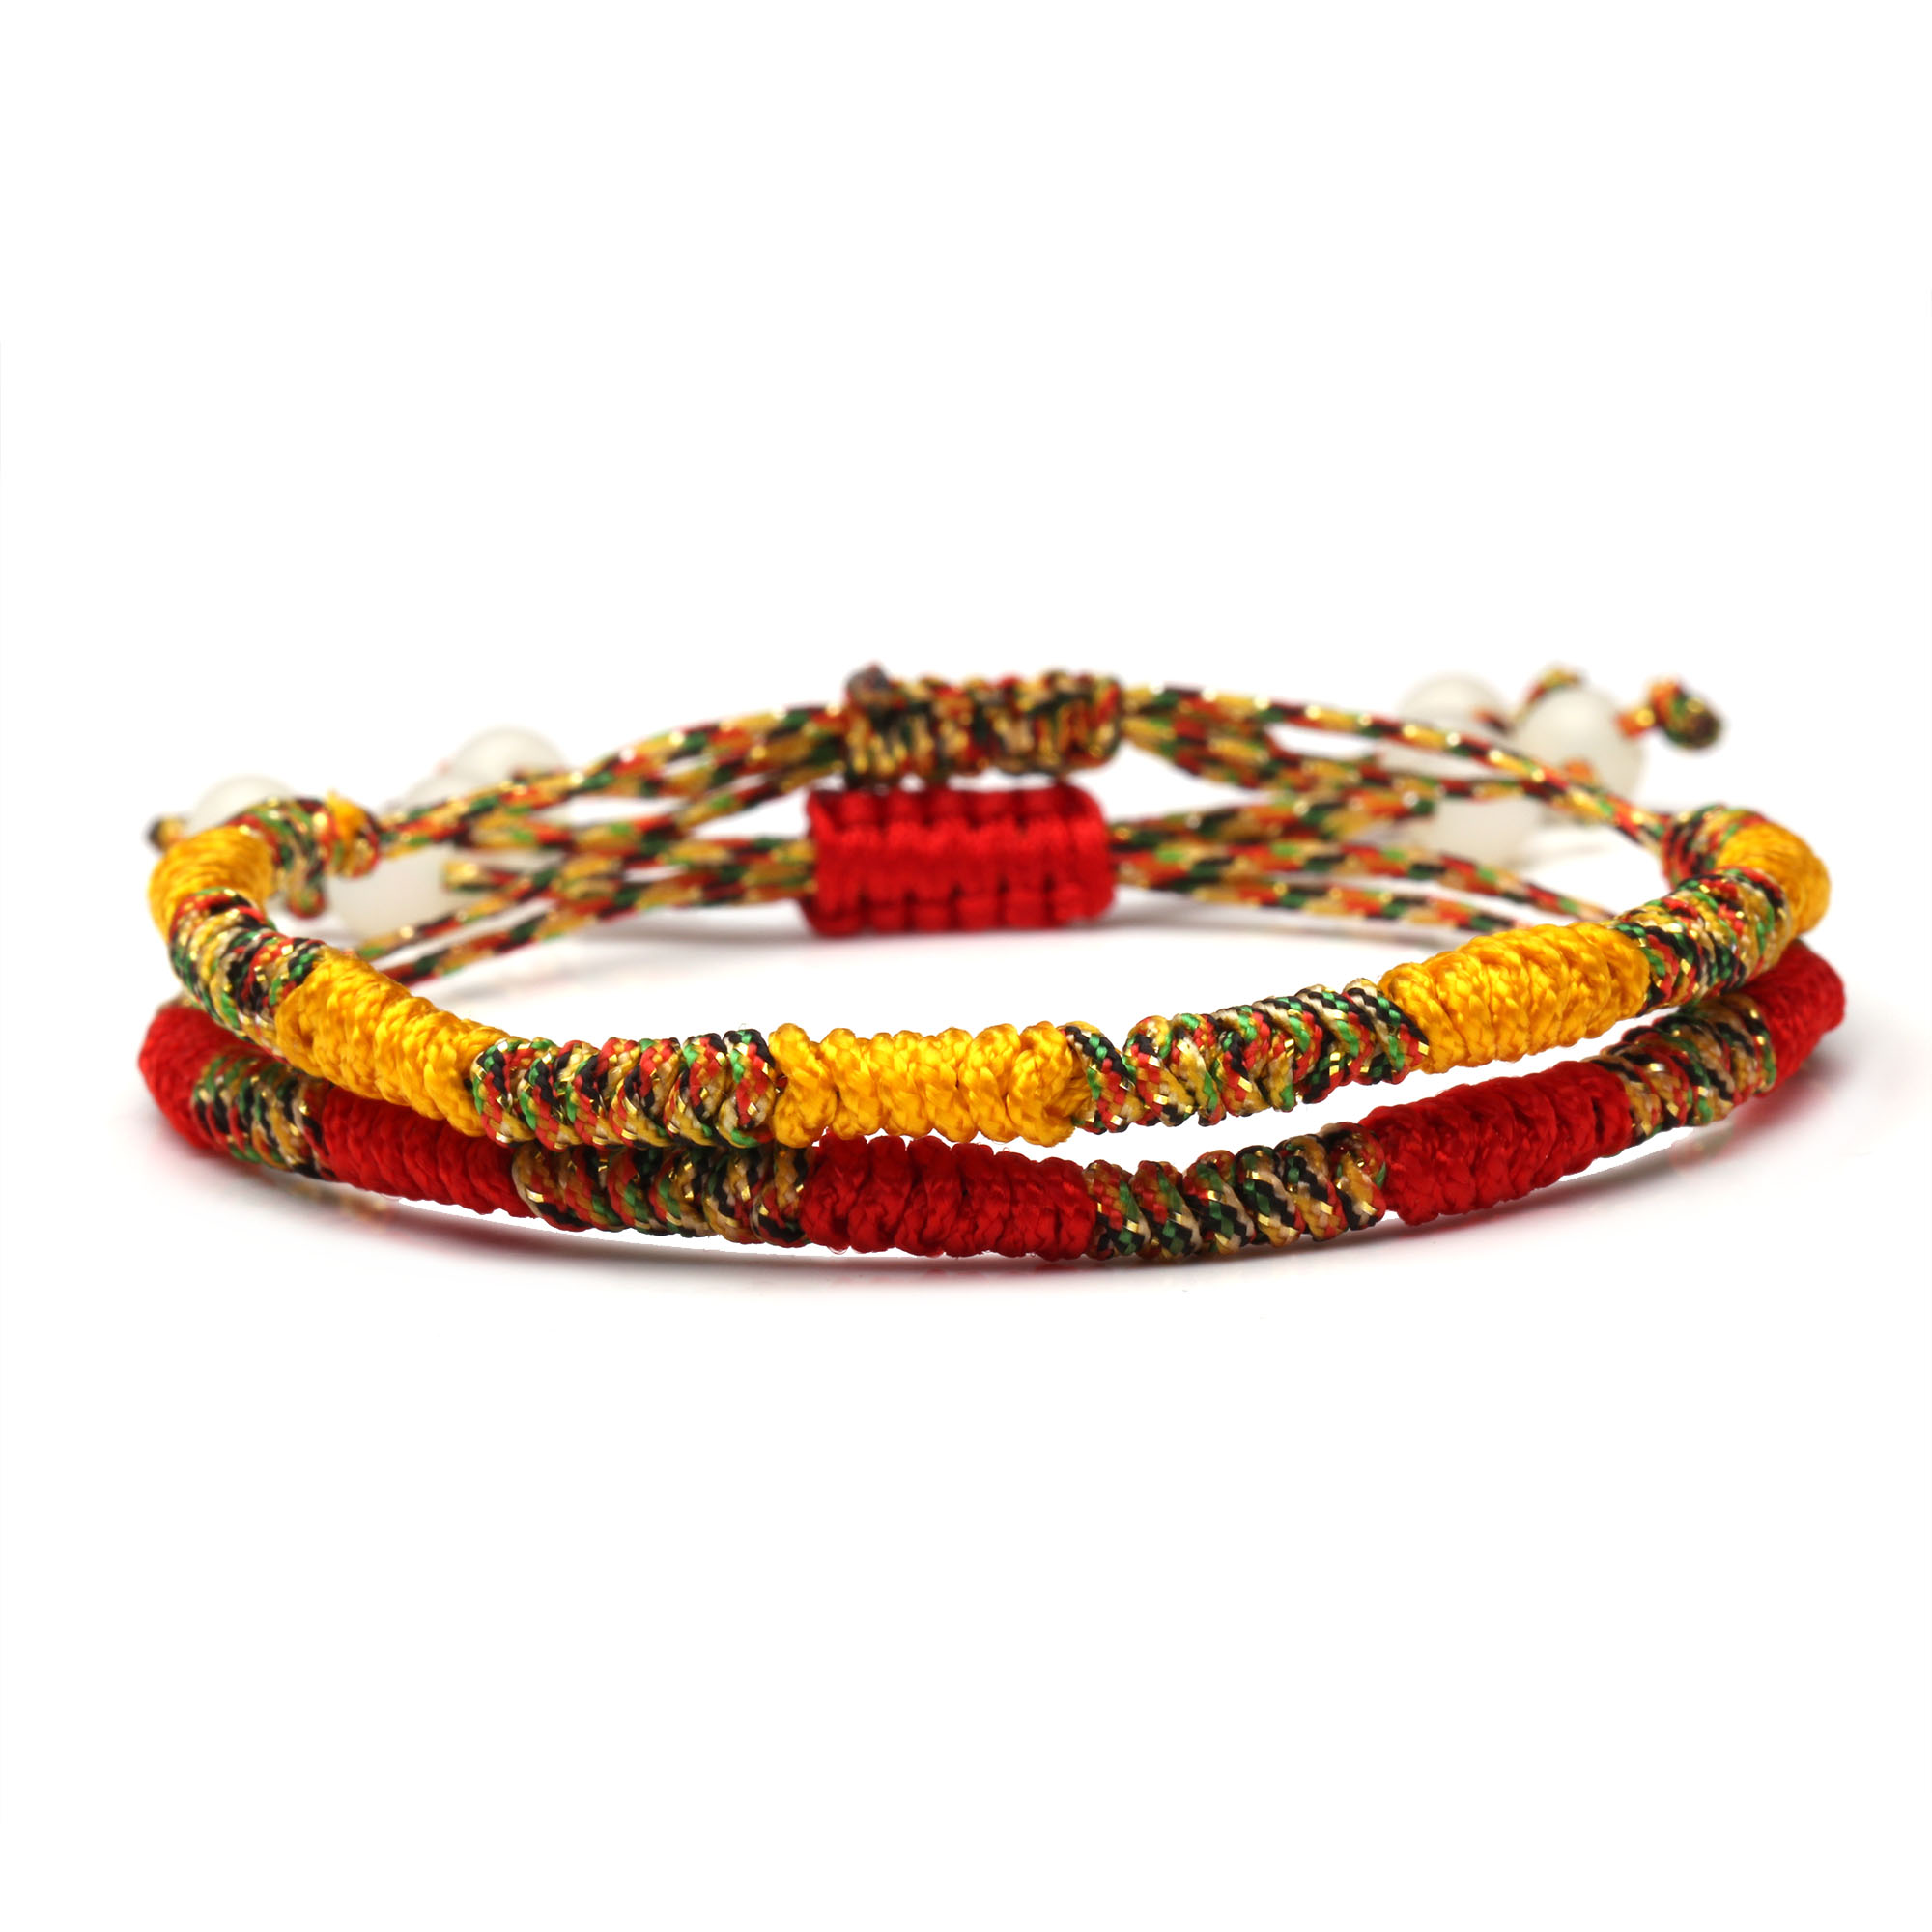 Tibetan Buddhist Lucky Knot Bracelet Women Men Earth Yellow Red Iridescent Mix Color String Braided Adjustable Bracelets Present